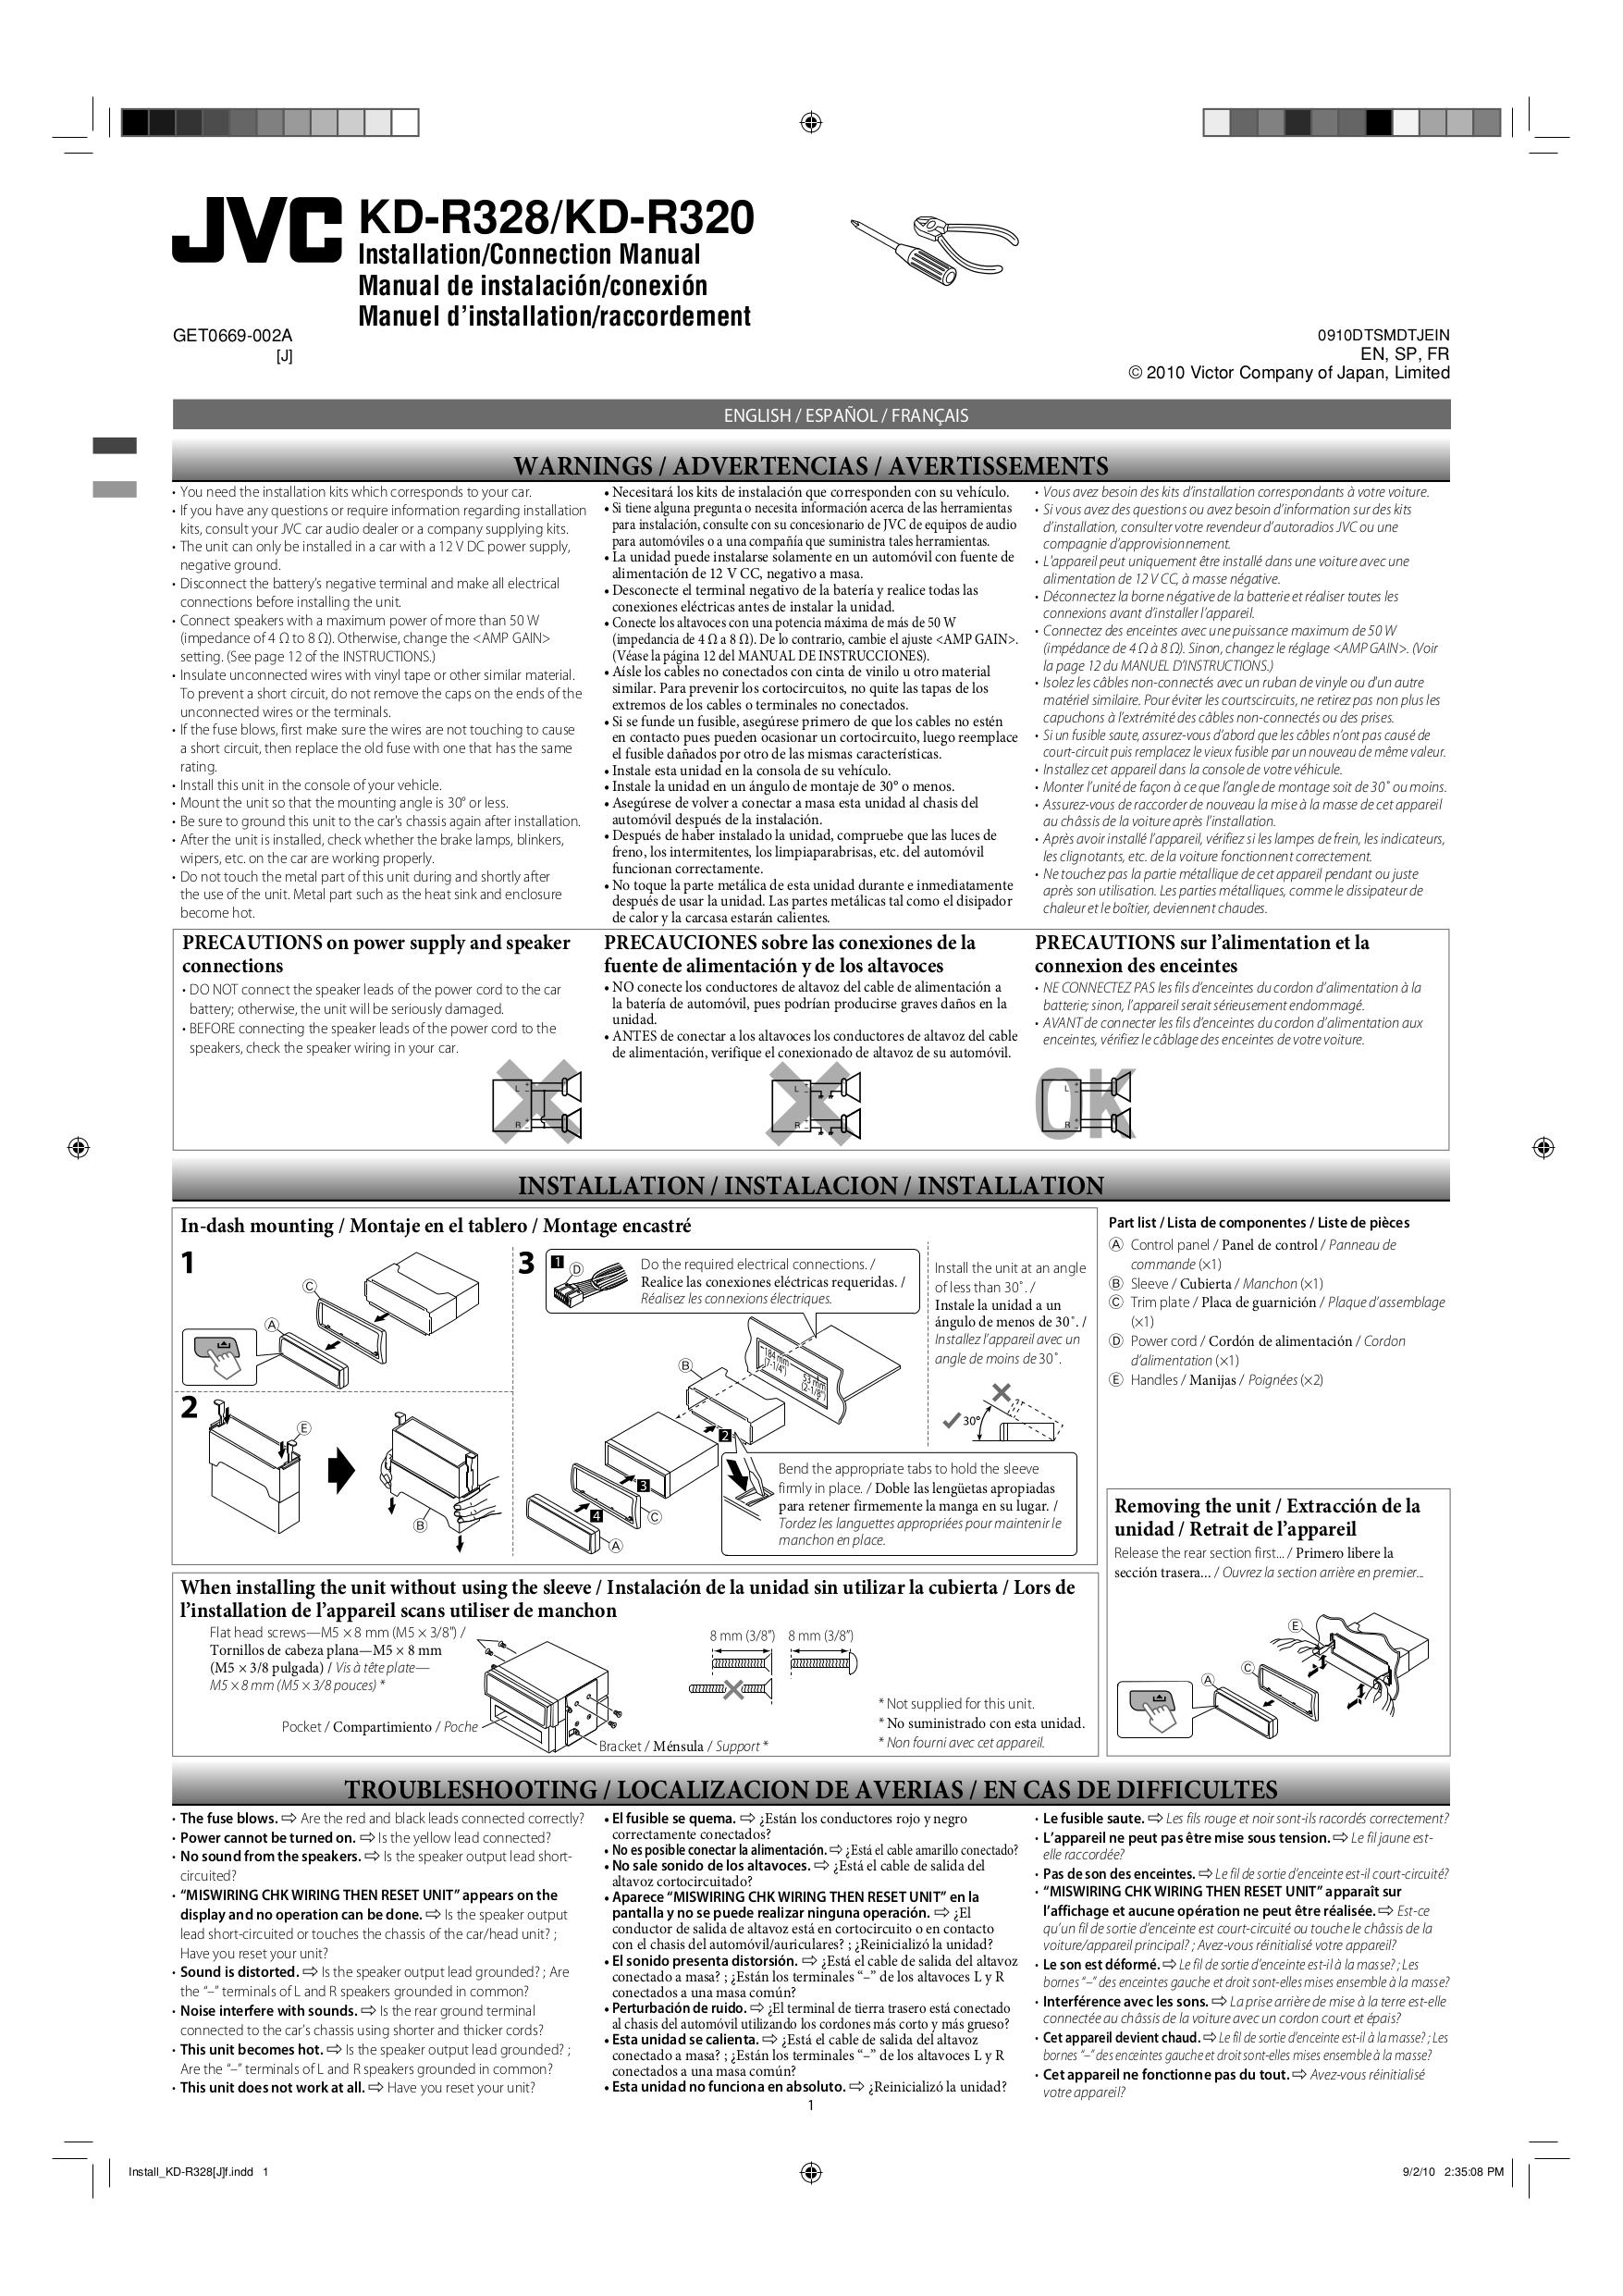 jvc kd r520 wiring diagram jvc wiring diagrams description pdf for jvc kd r320 car receiver manual on wiring diagram